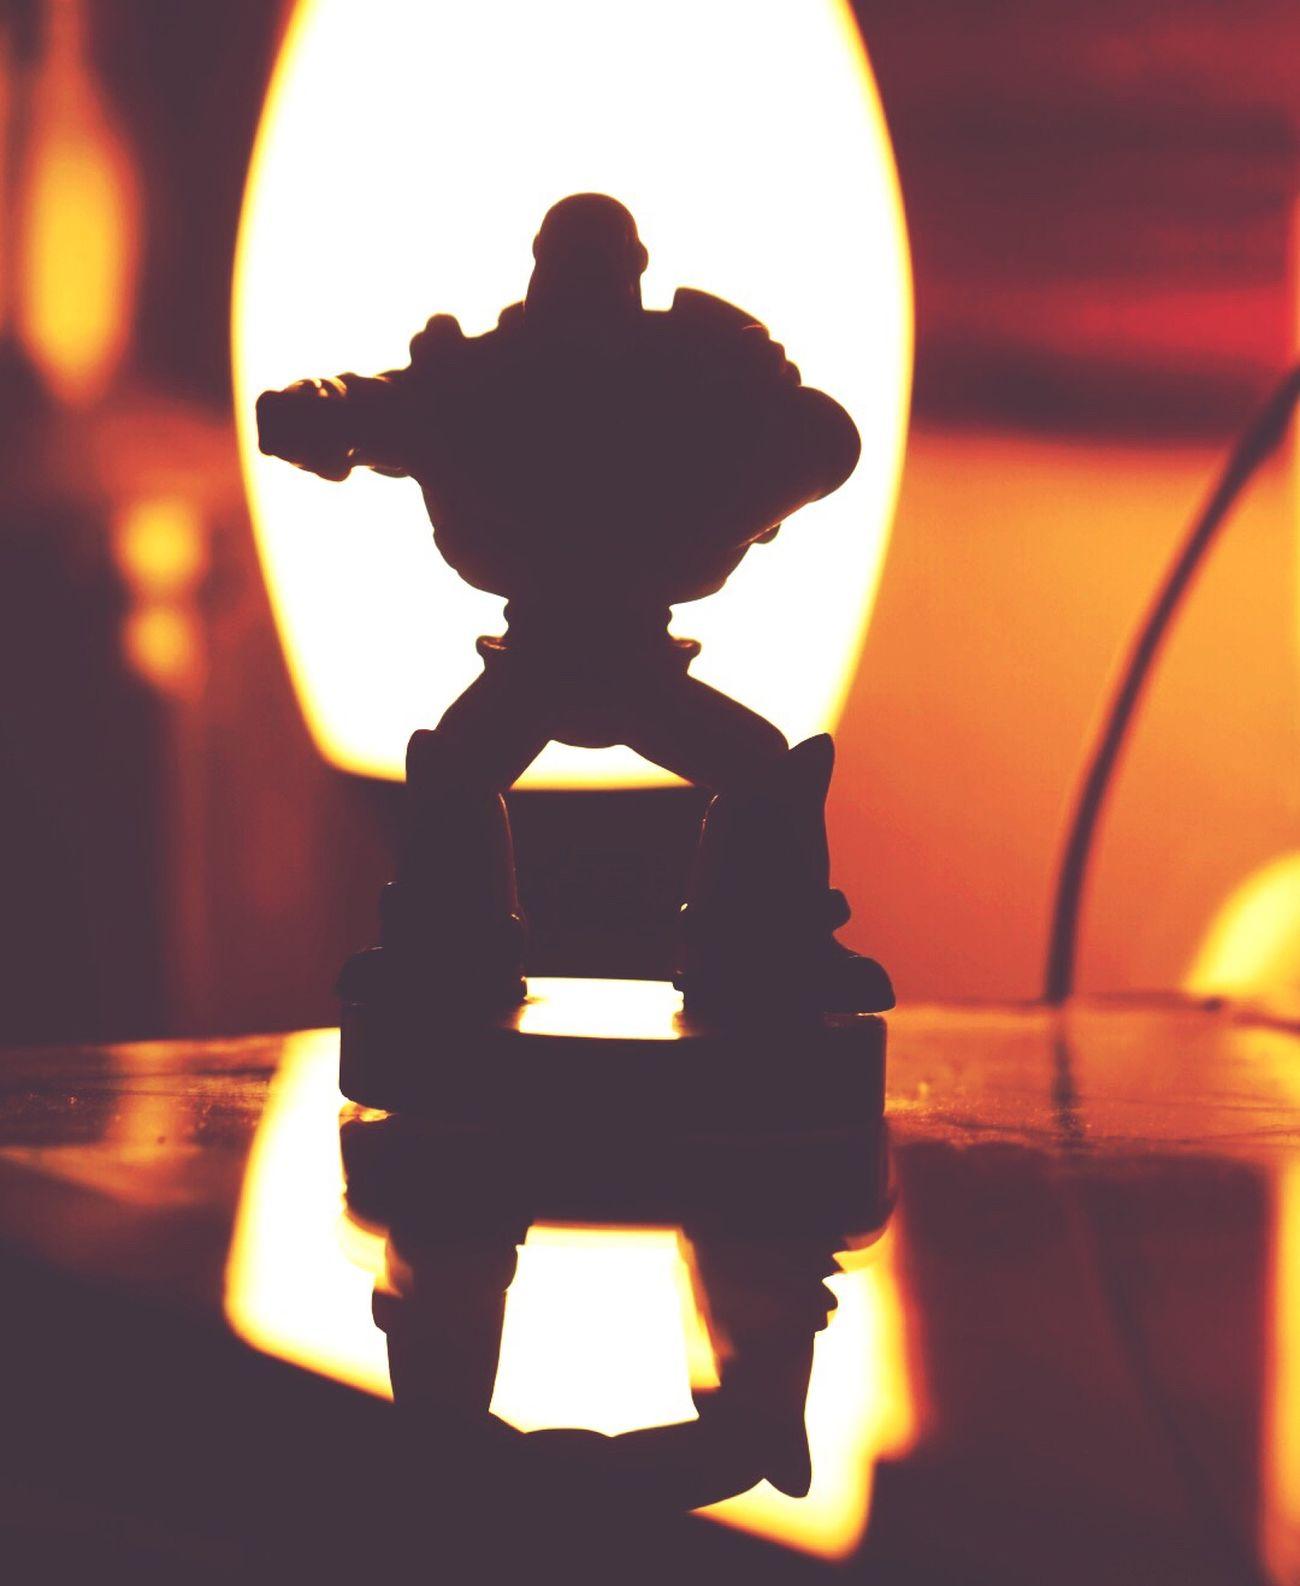 Toy story life Pixar  Buzzlightyear Silhouette Toyphotography Tunisia EyeEmNewHere